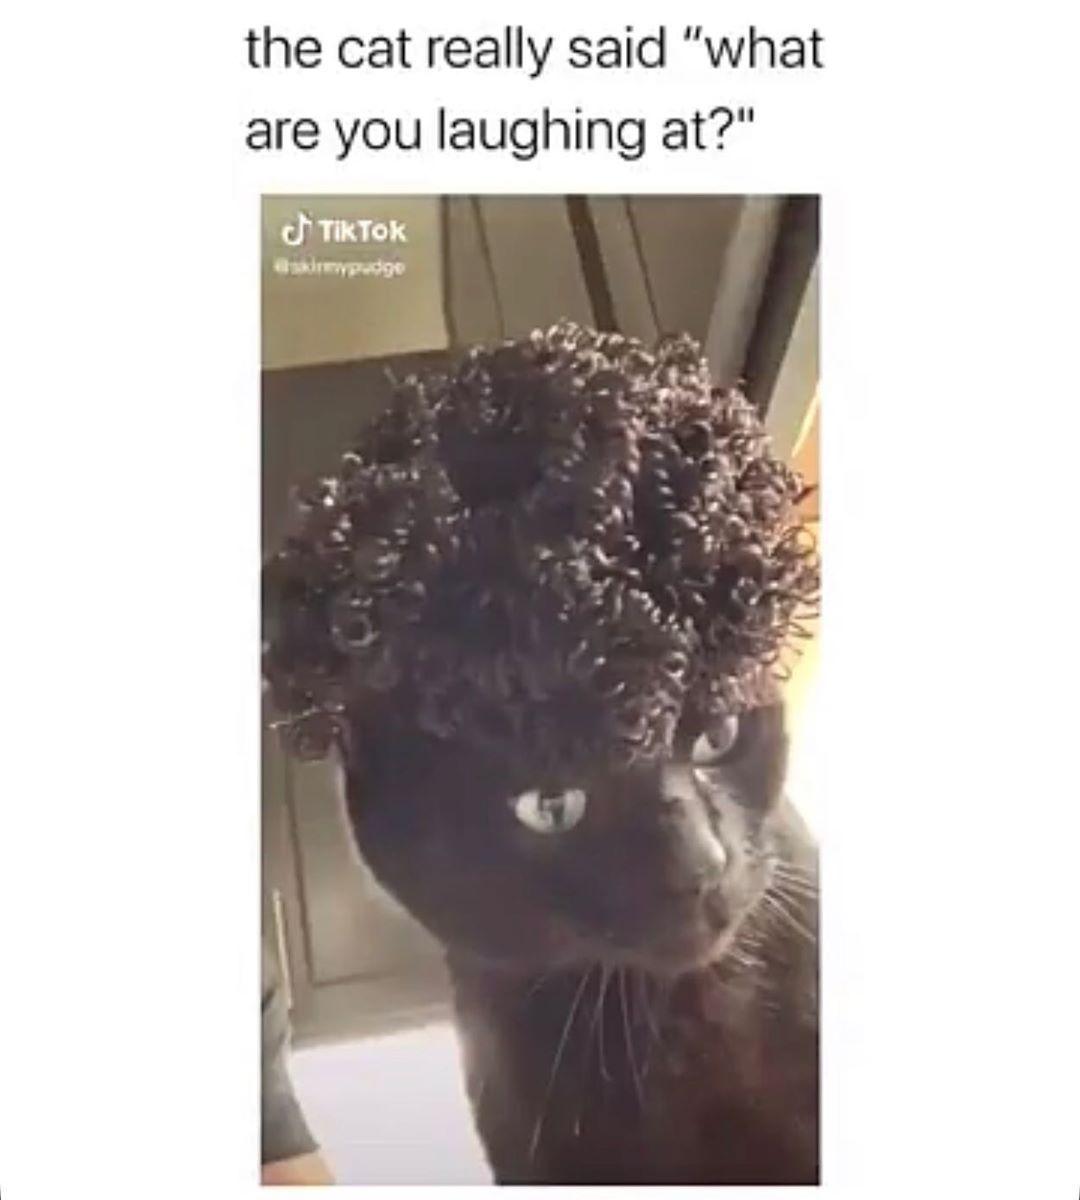 ... | 9meme.fun  #add #comedy #dailylols #dankmeme #emrubb #epic #f #f4f #follow #followbackalways #followme #freshmeme #funnies #funny #humor #humour #instagood #internetlols #internetmeme #laughs #like #lol #meme #memes #memesofinstagram #photooftheday #rainbowofmeme #shitsandgiggles #snapchat